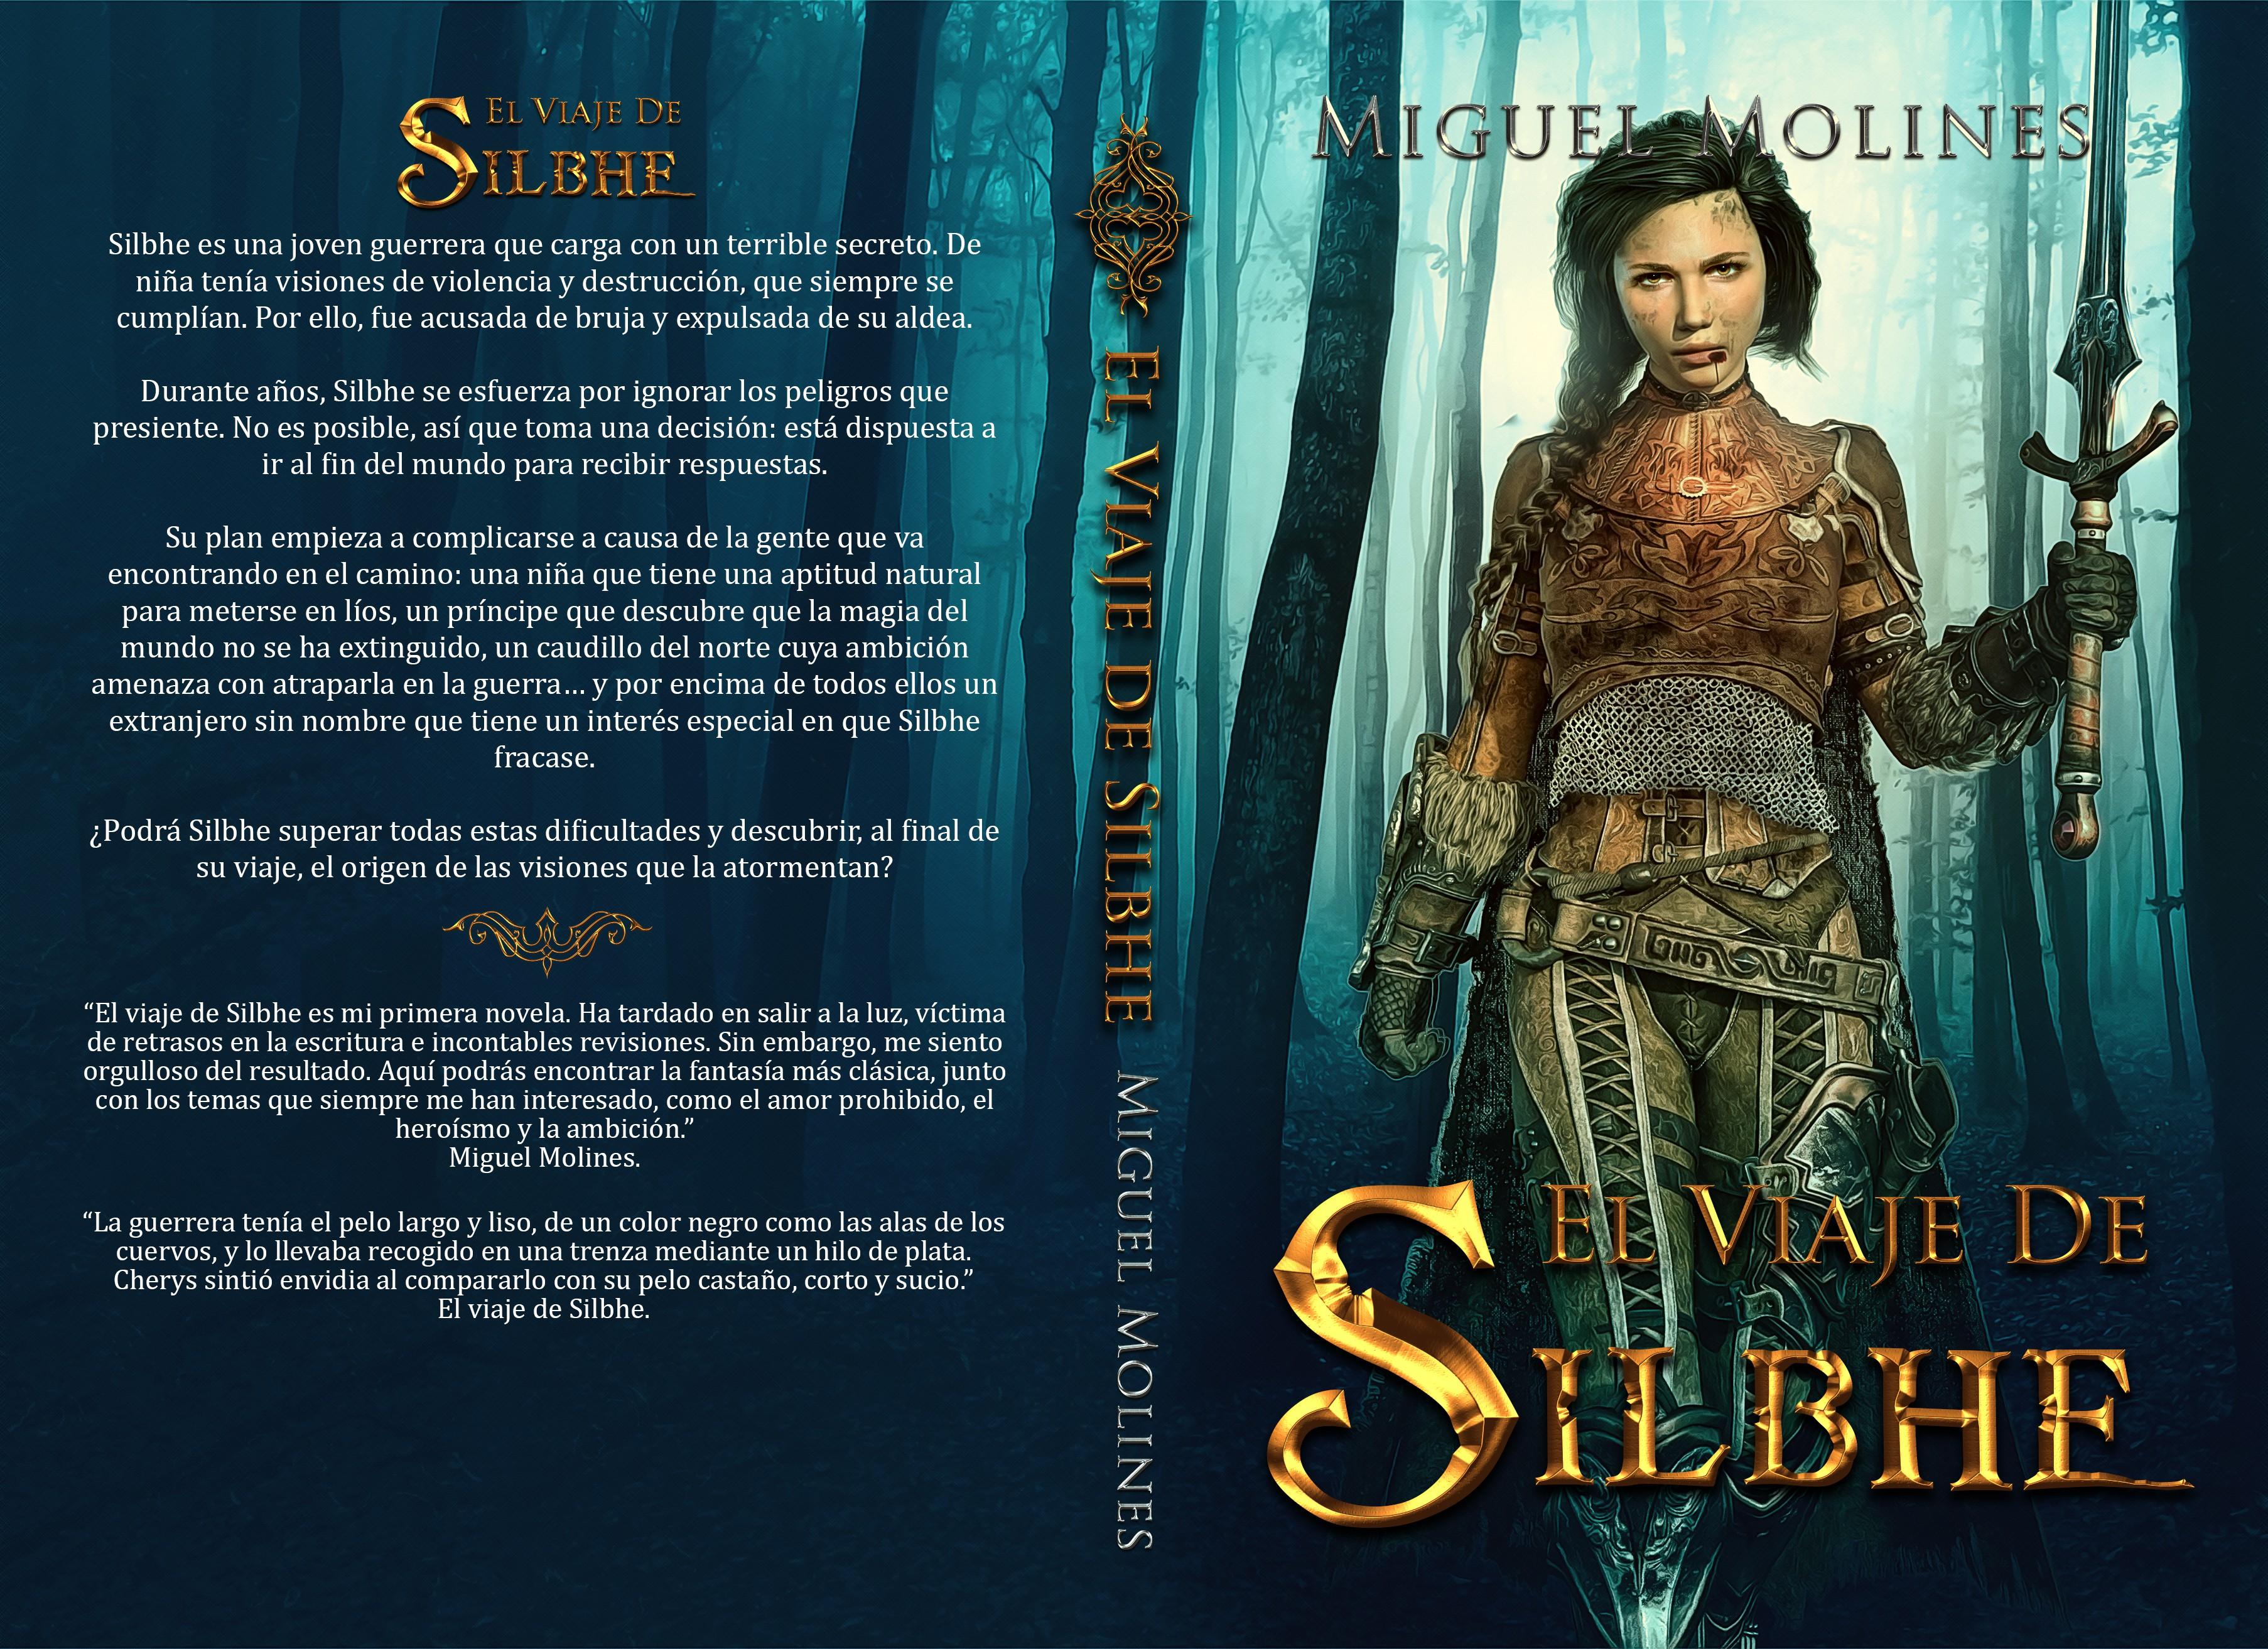 Design a cover (ebook and print) for a fantasy novel with a strong female hero, El viaje de Silbhe